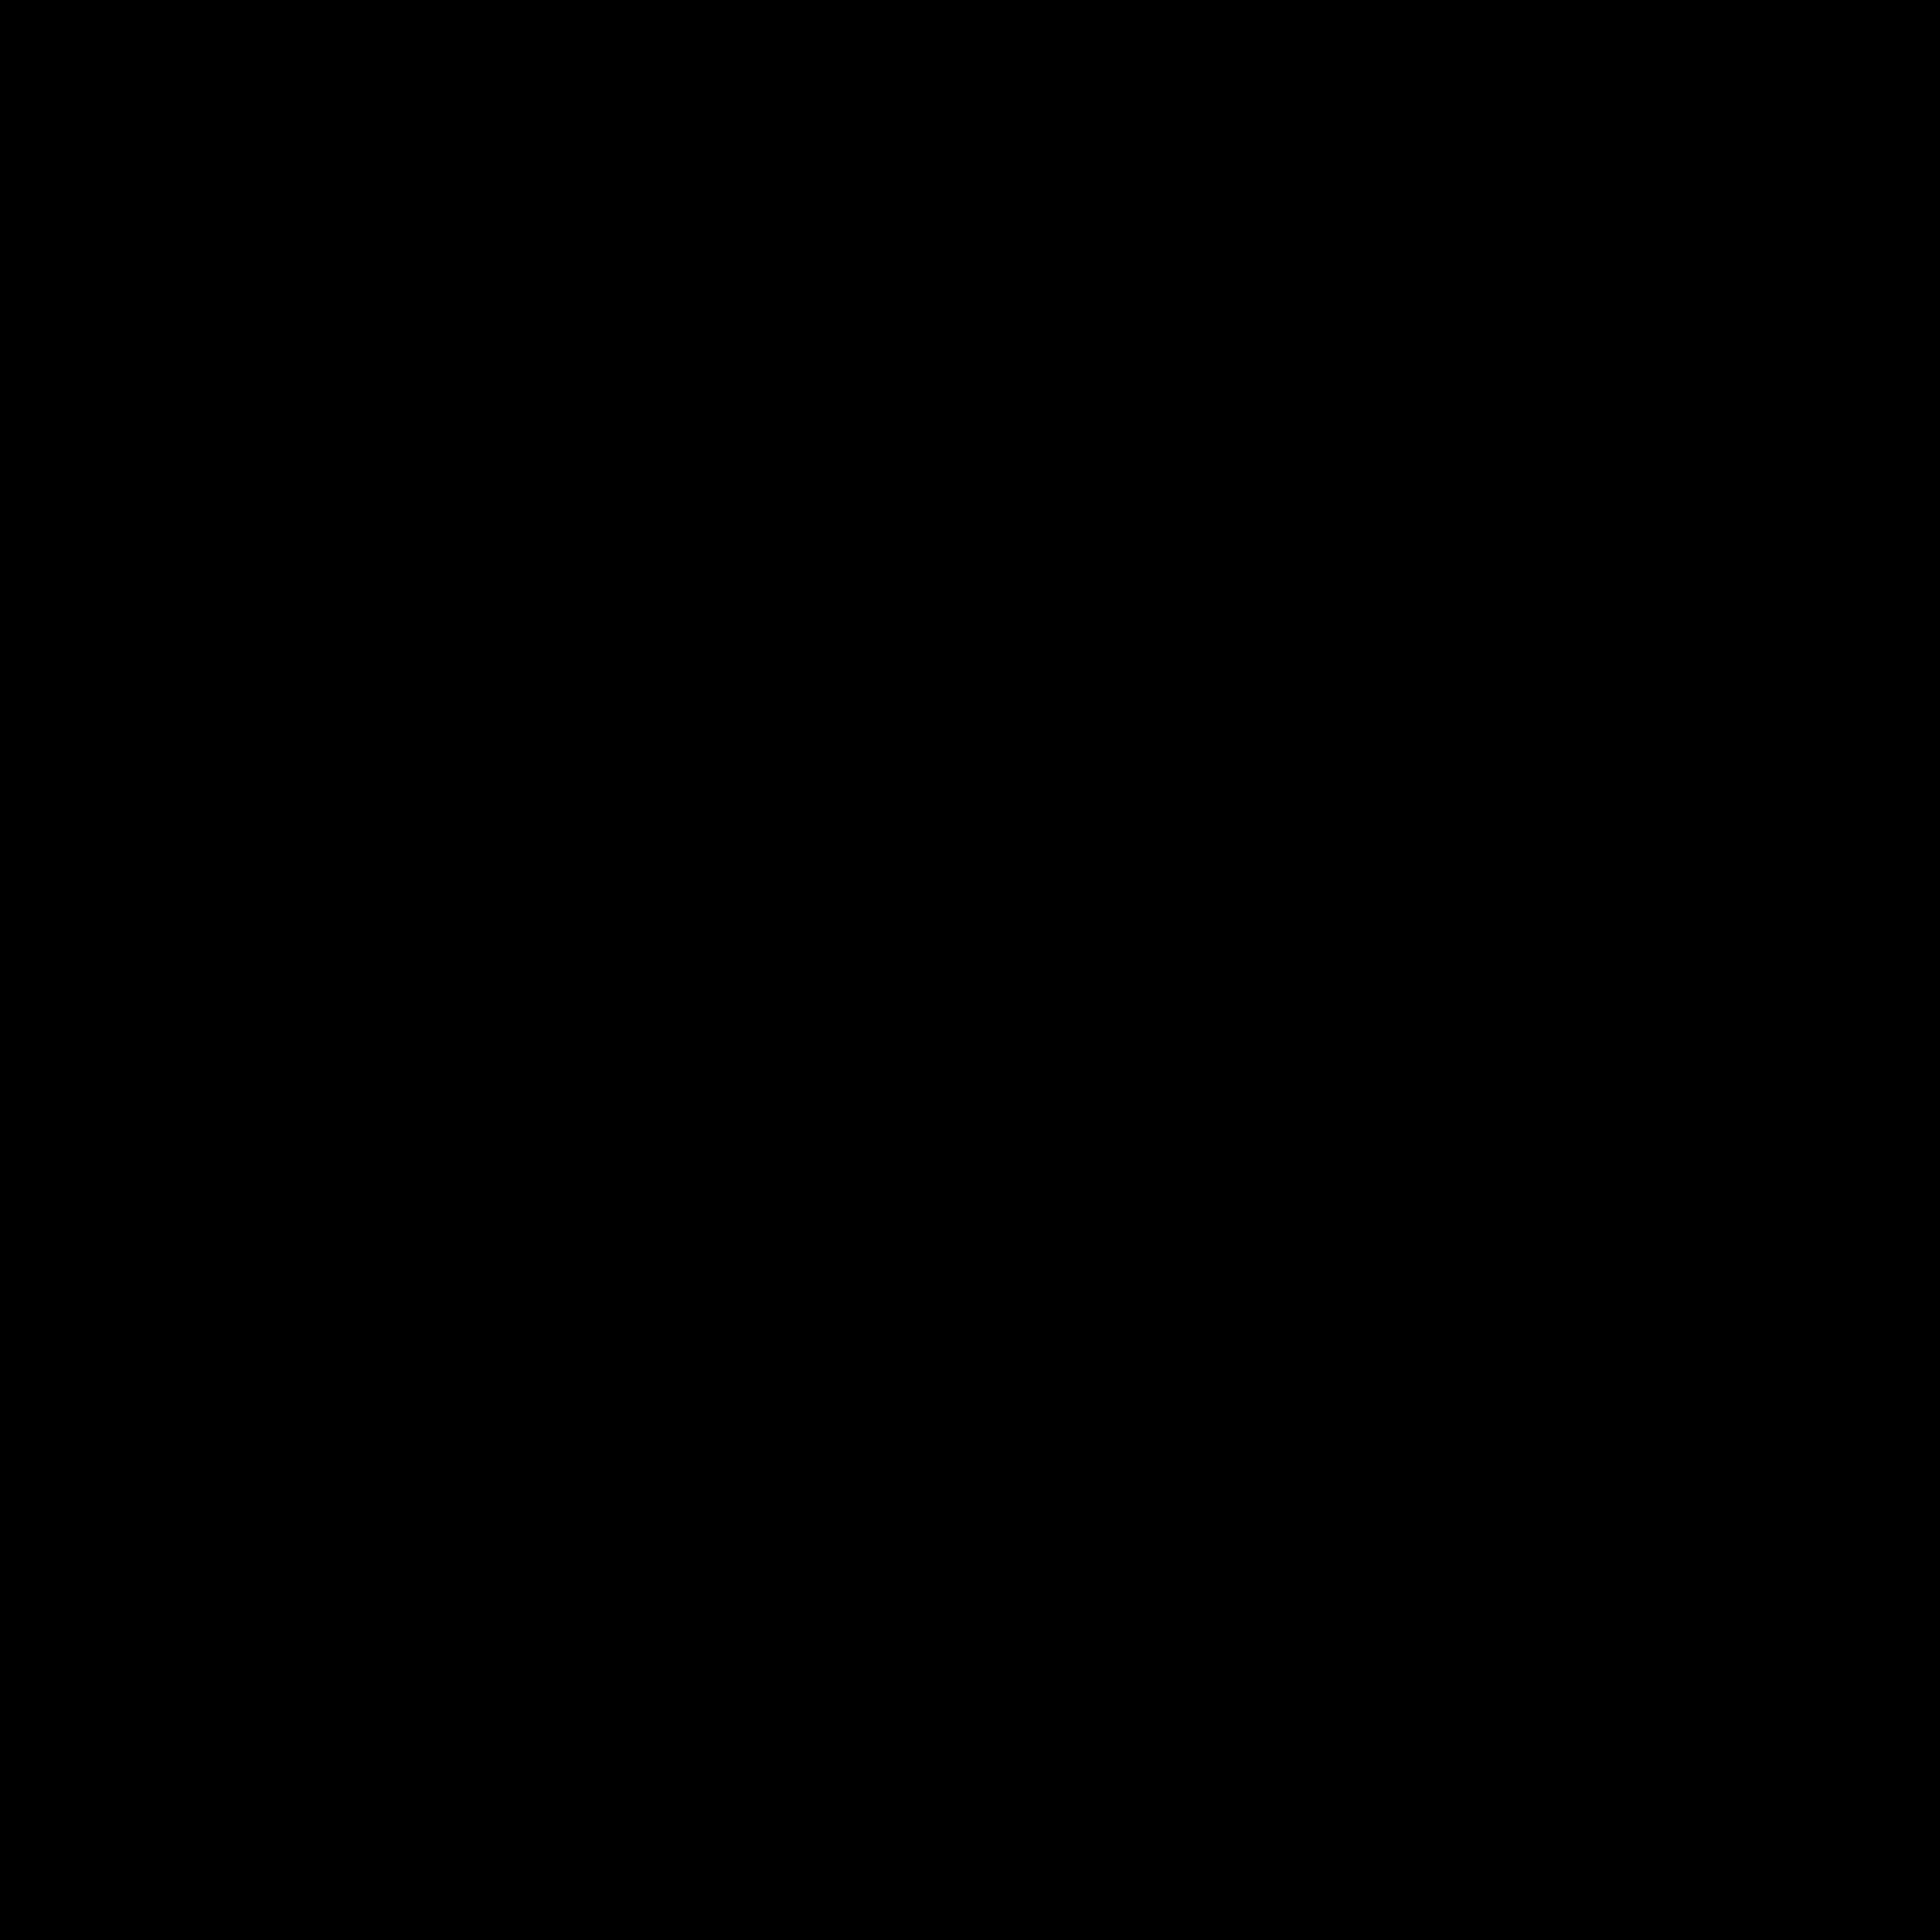 2048x2048 Black Solid Color Background